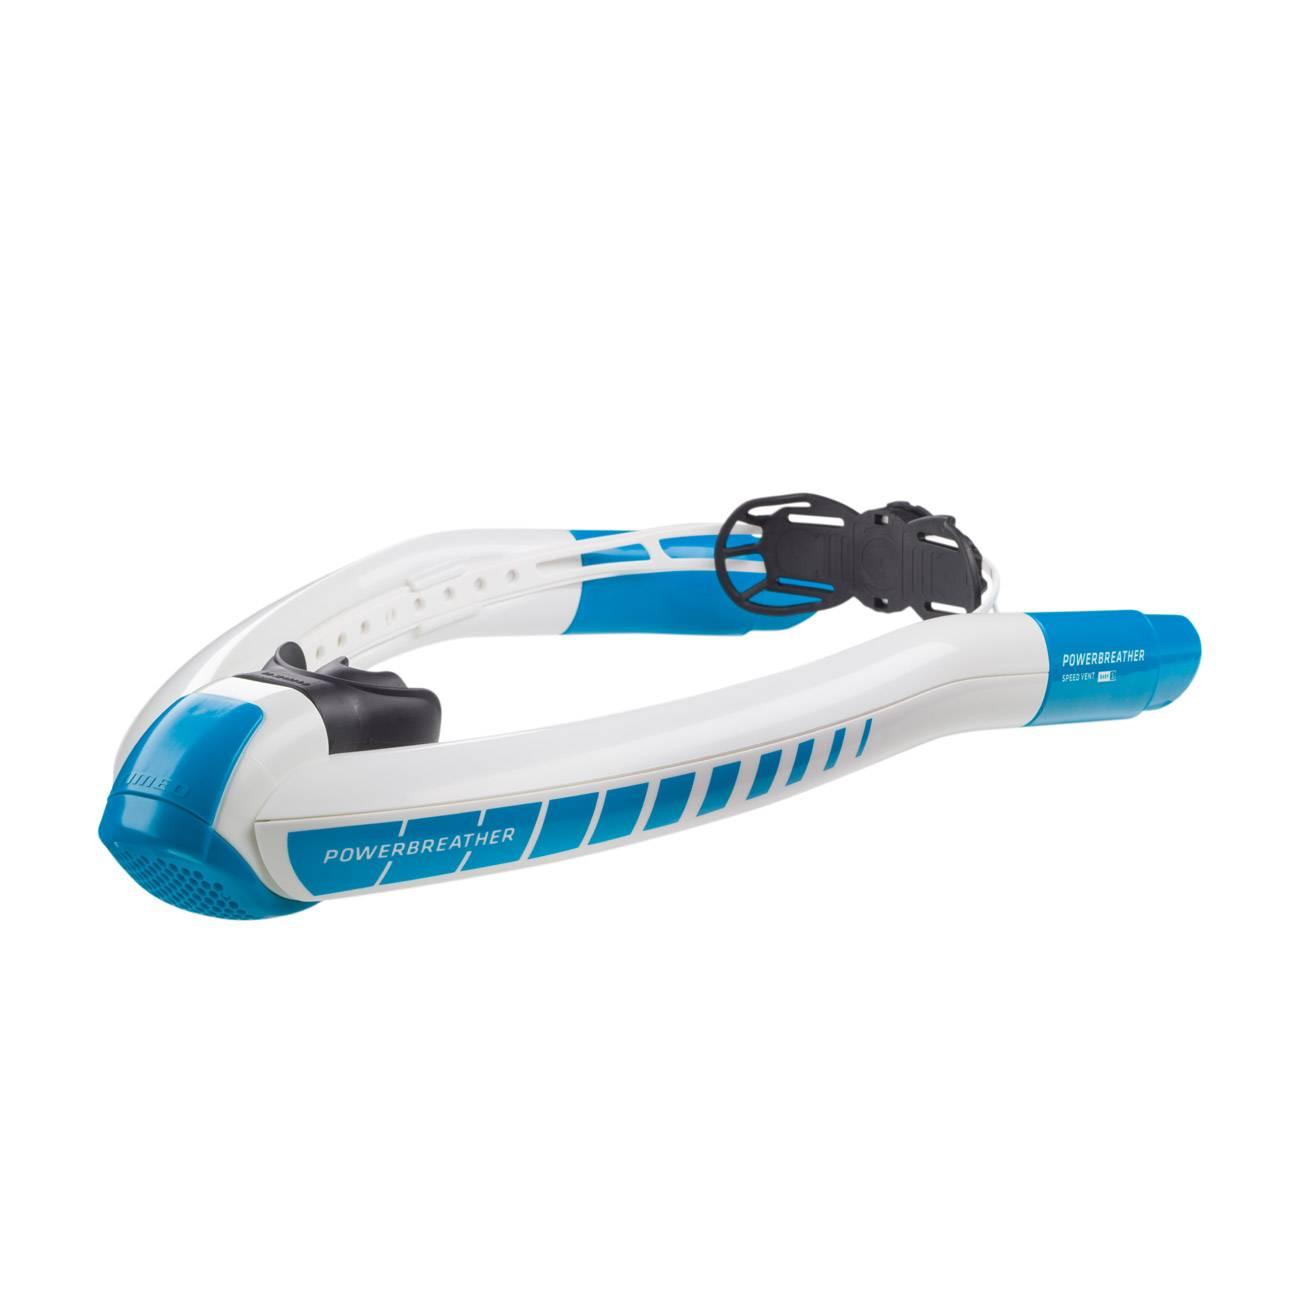 Powerbreather Wave Edition - Snorkel 2.0 imagine